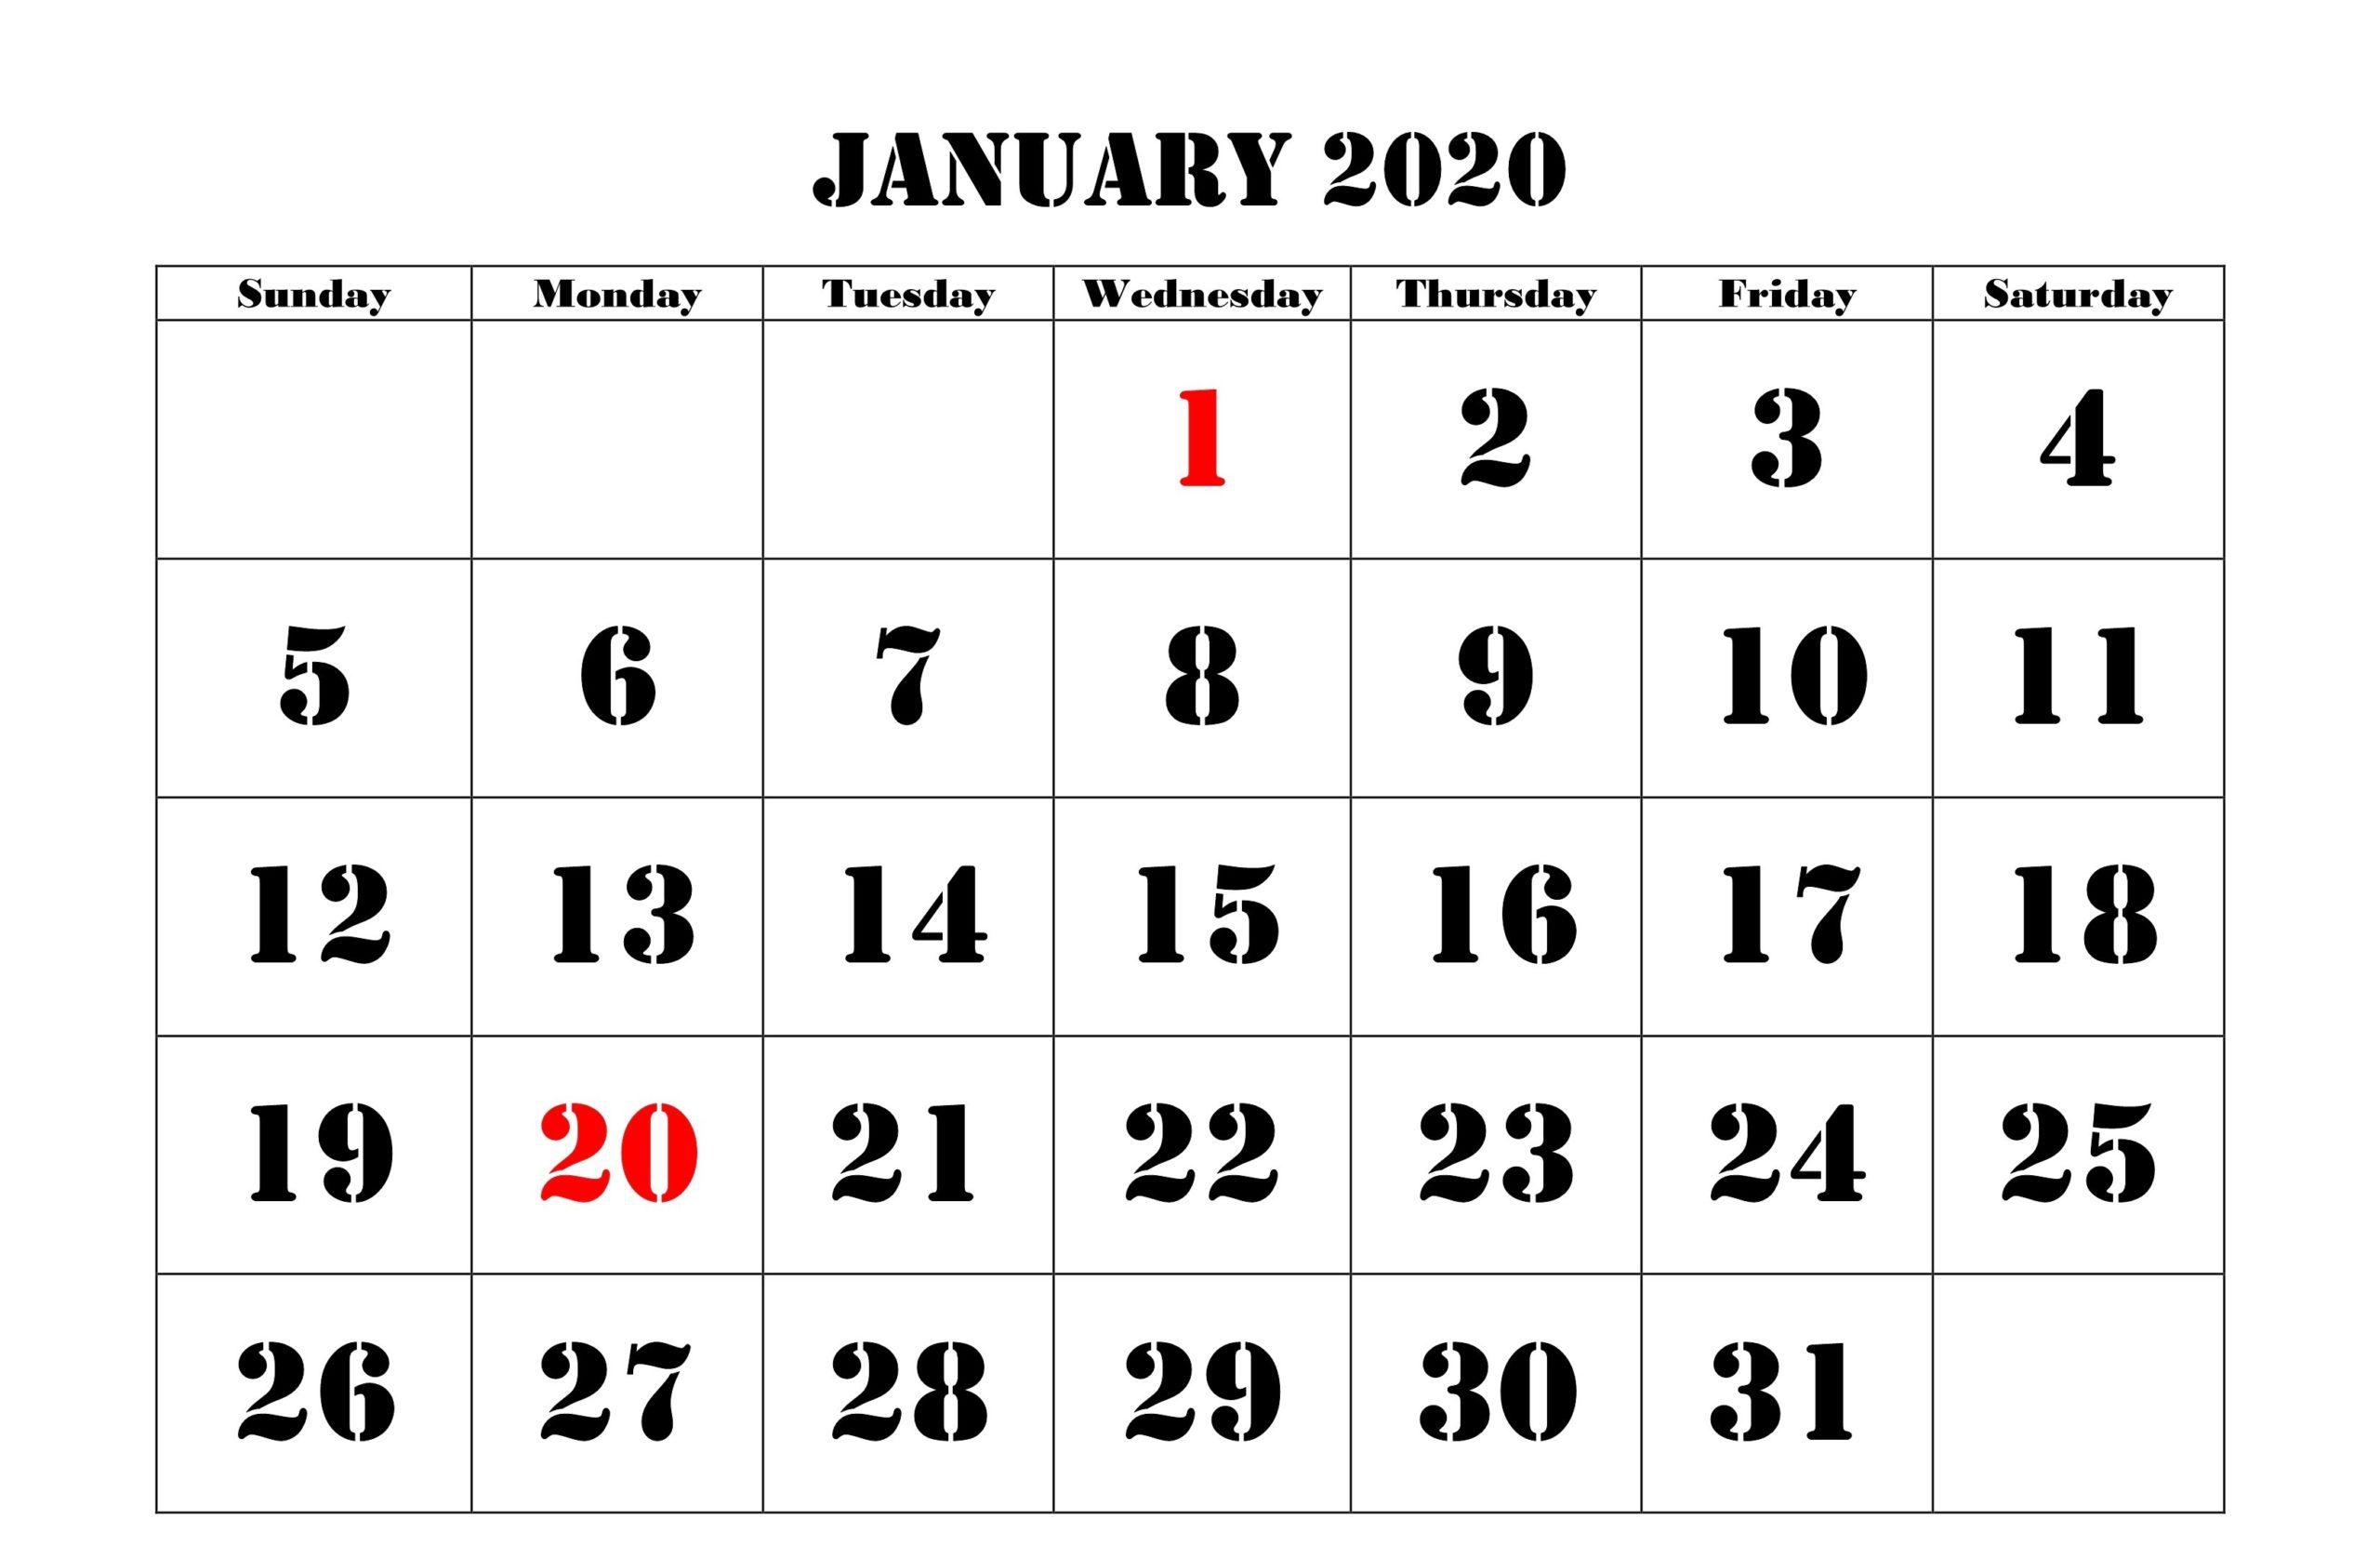 January 2020 Calendar Fillable Template